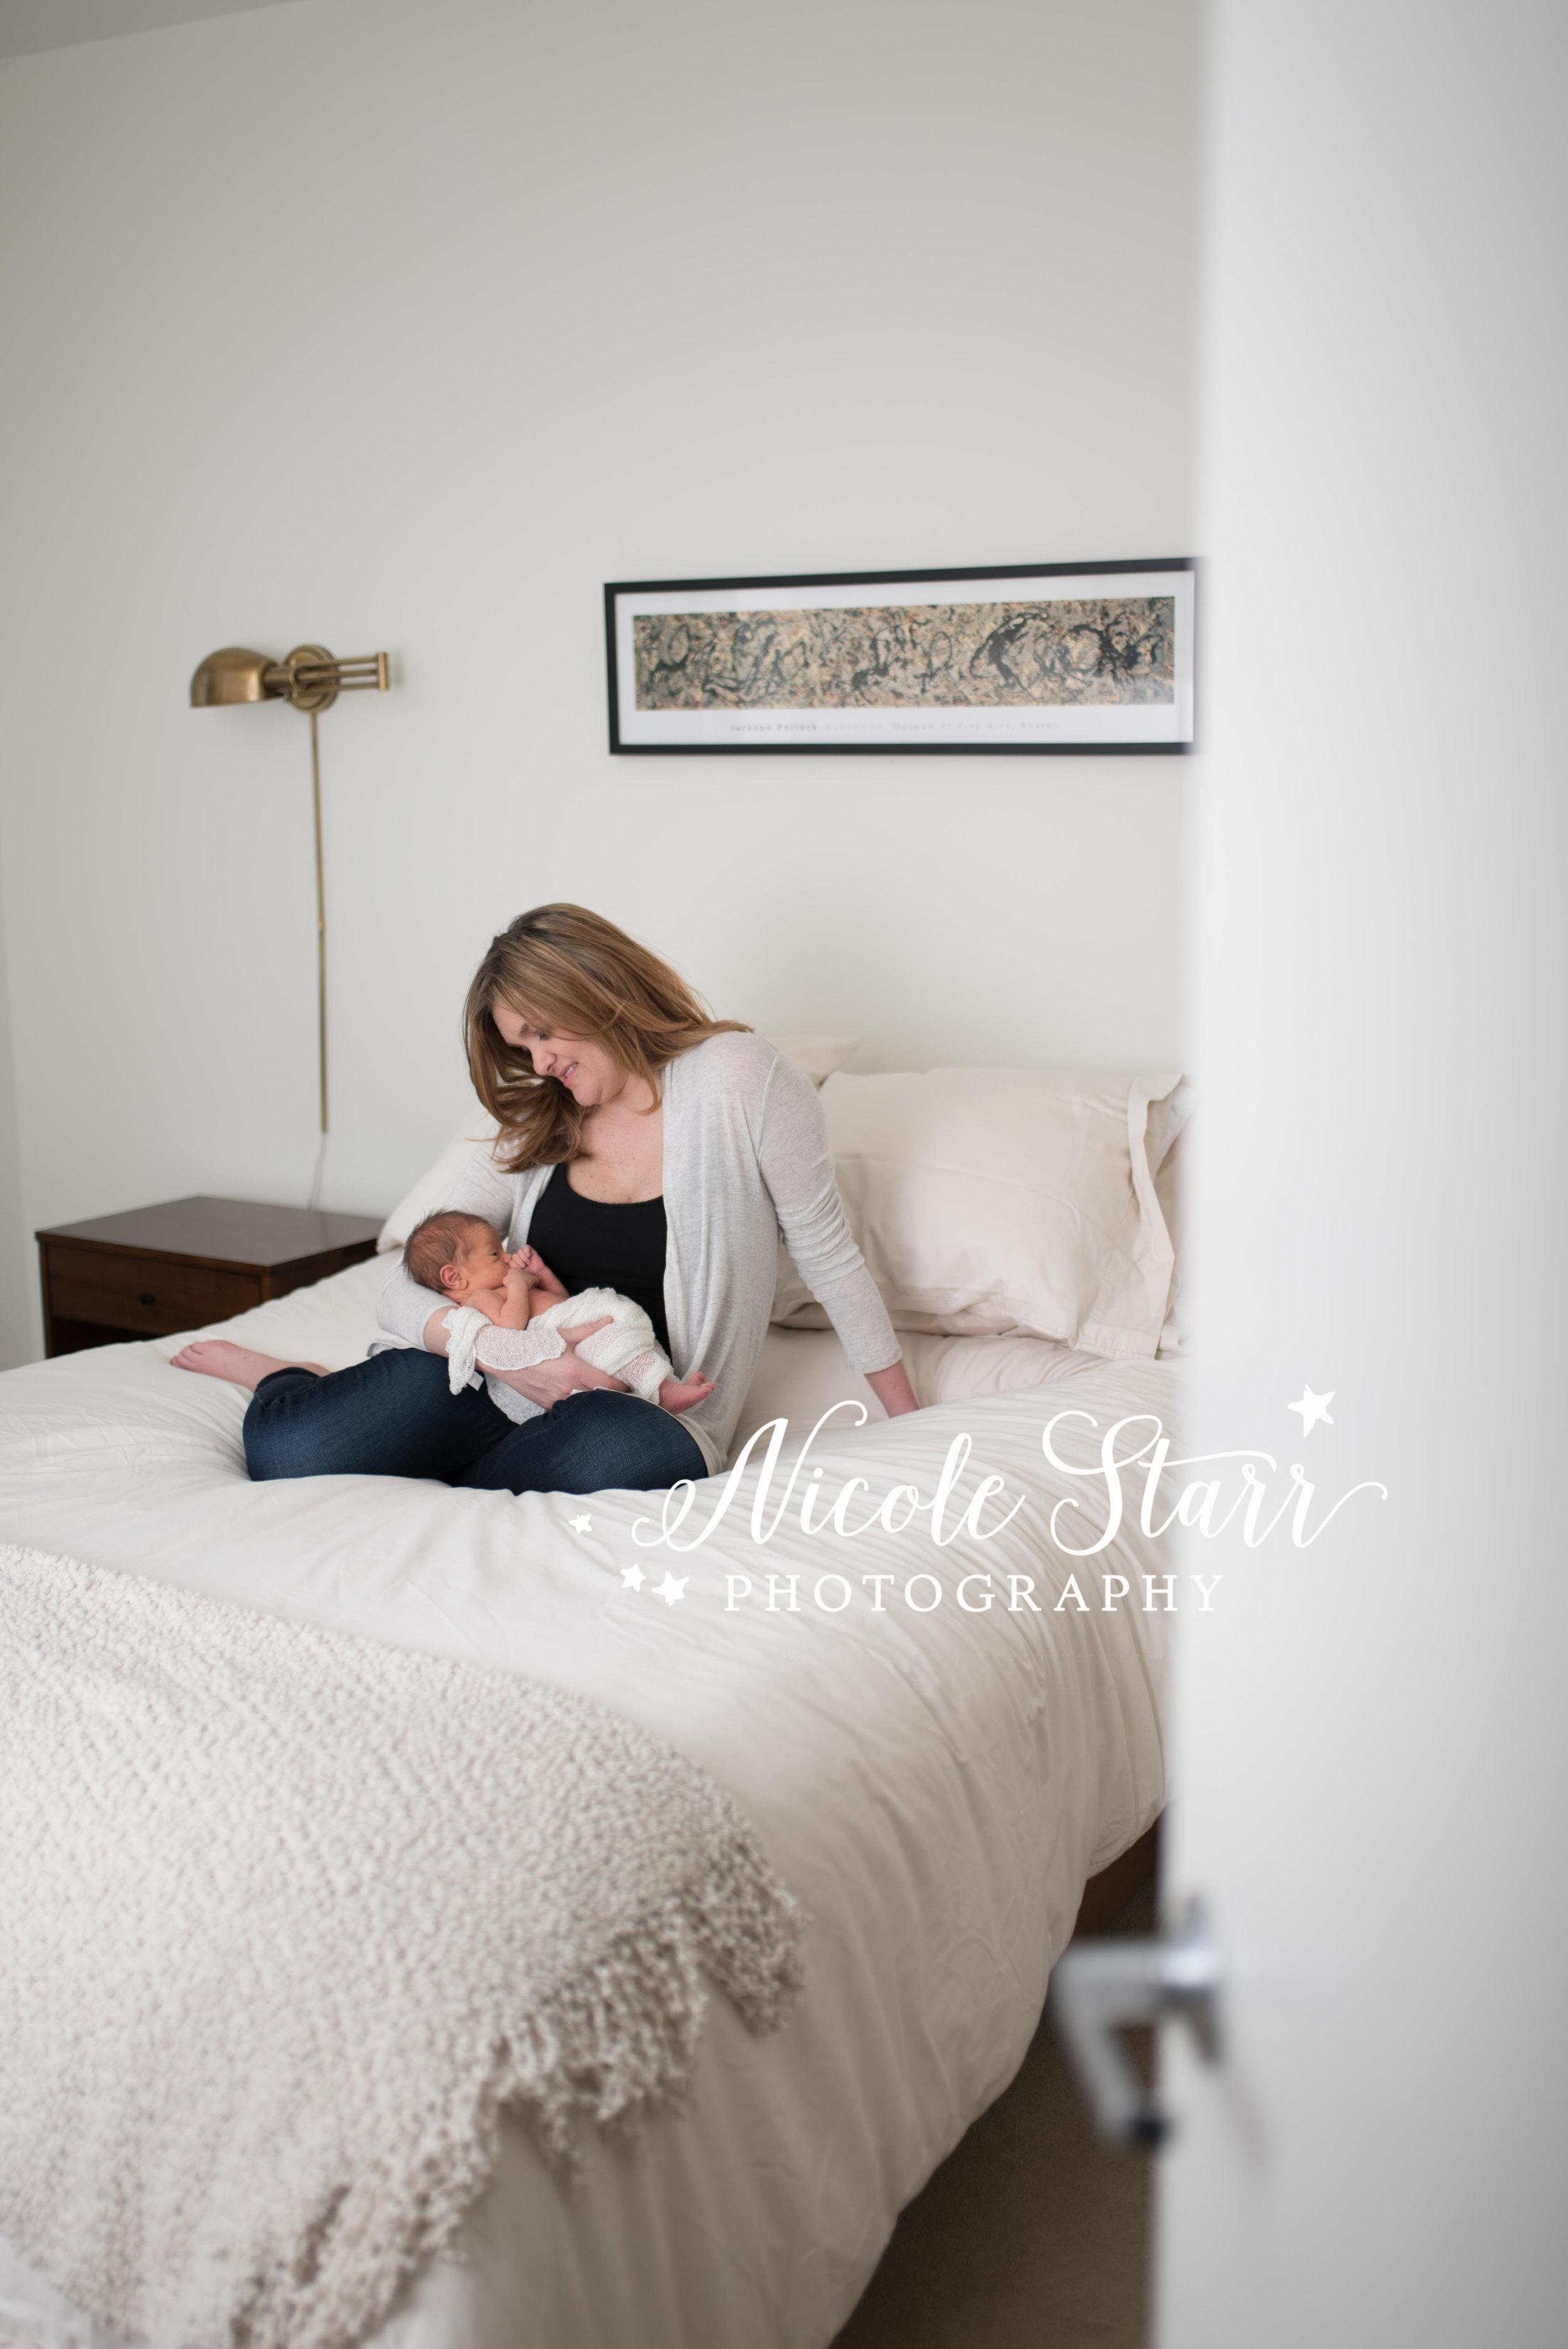 Nicole Starr Photography | Saratoga Springs Newborn Photographer | Boston Newborn Photographer | Saratoga Springs Lifestyle Newborn Photographer | Boston Lifestyle Newborn Photographer